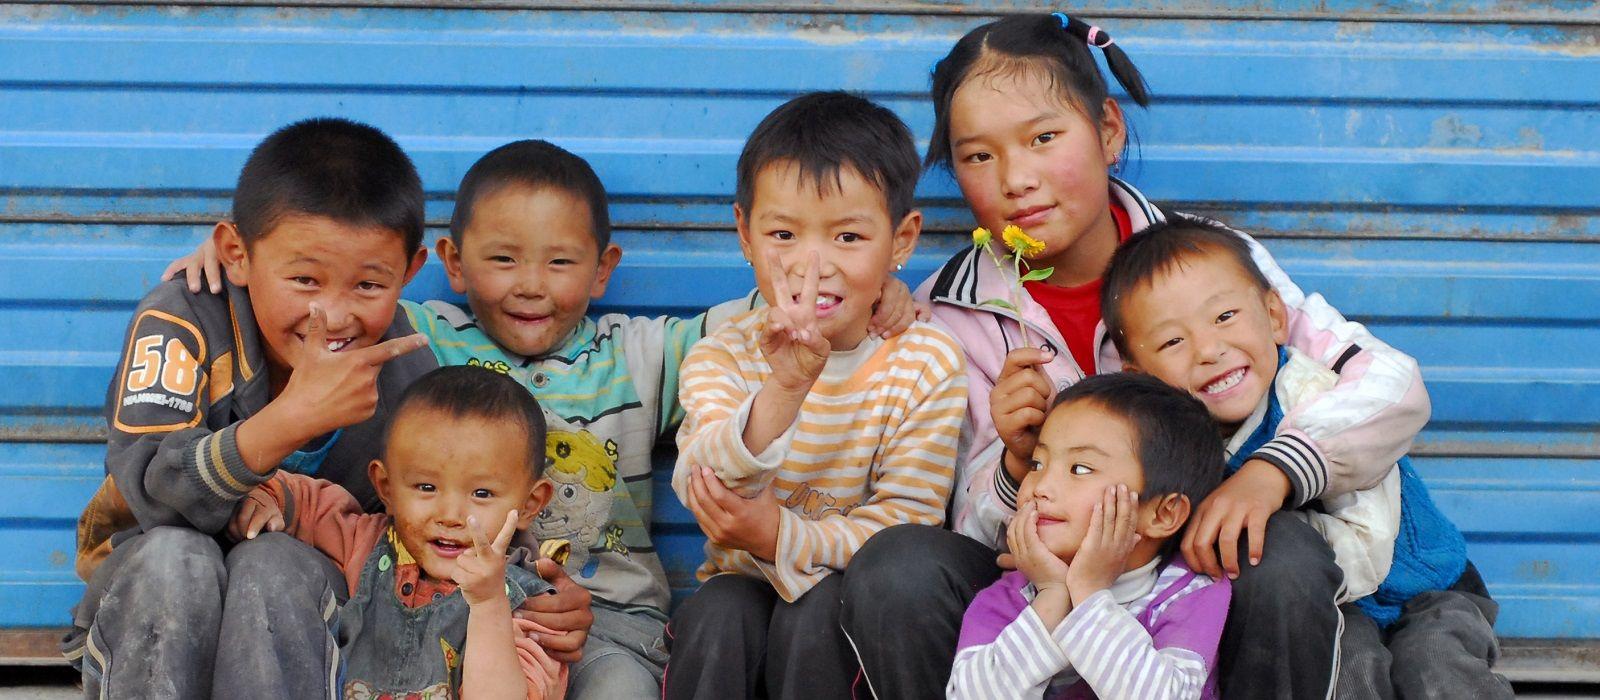 Highlights der Himalayas: Nepal, Bhutan und Tibet Urlaub 2